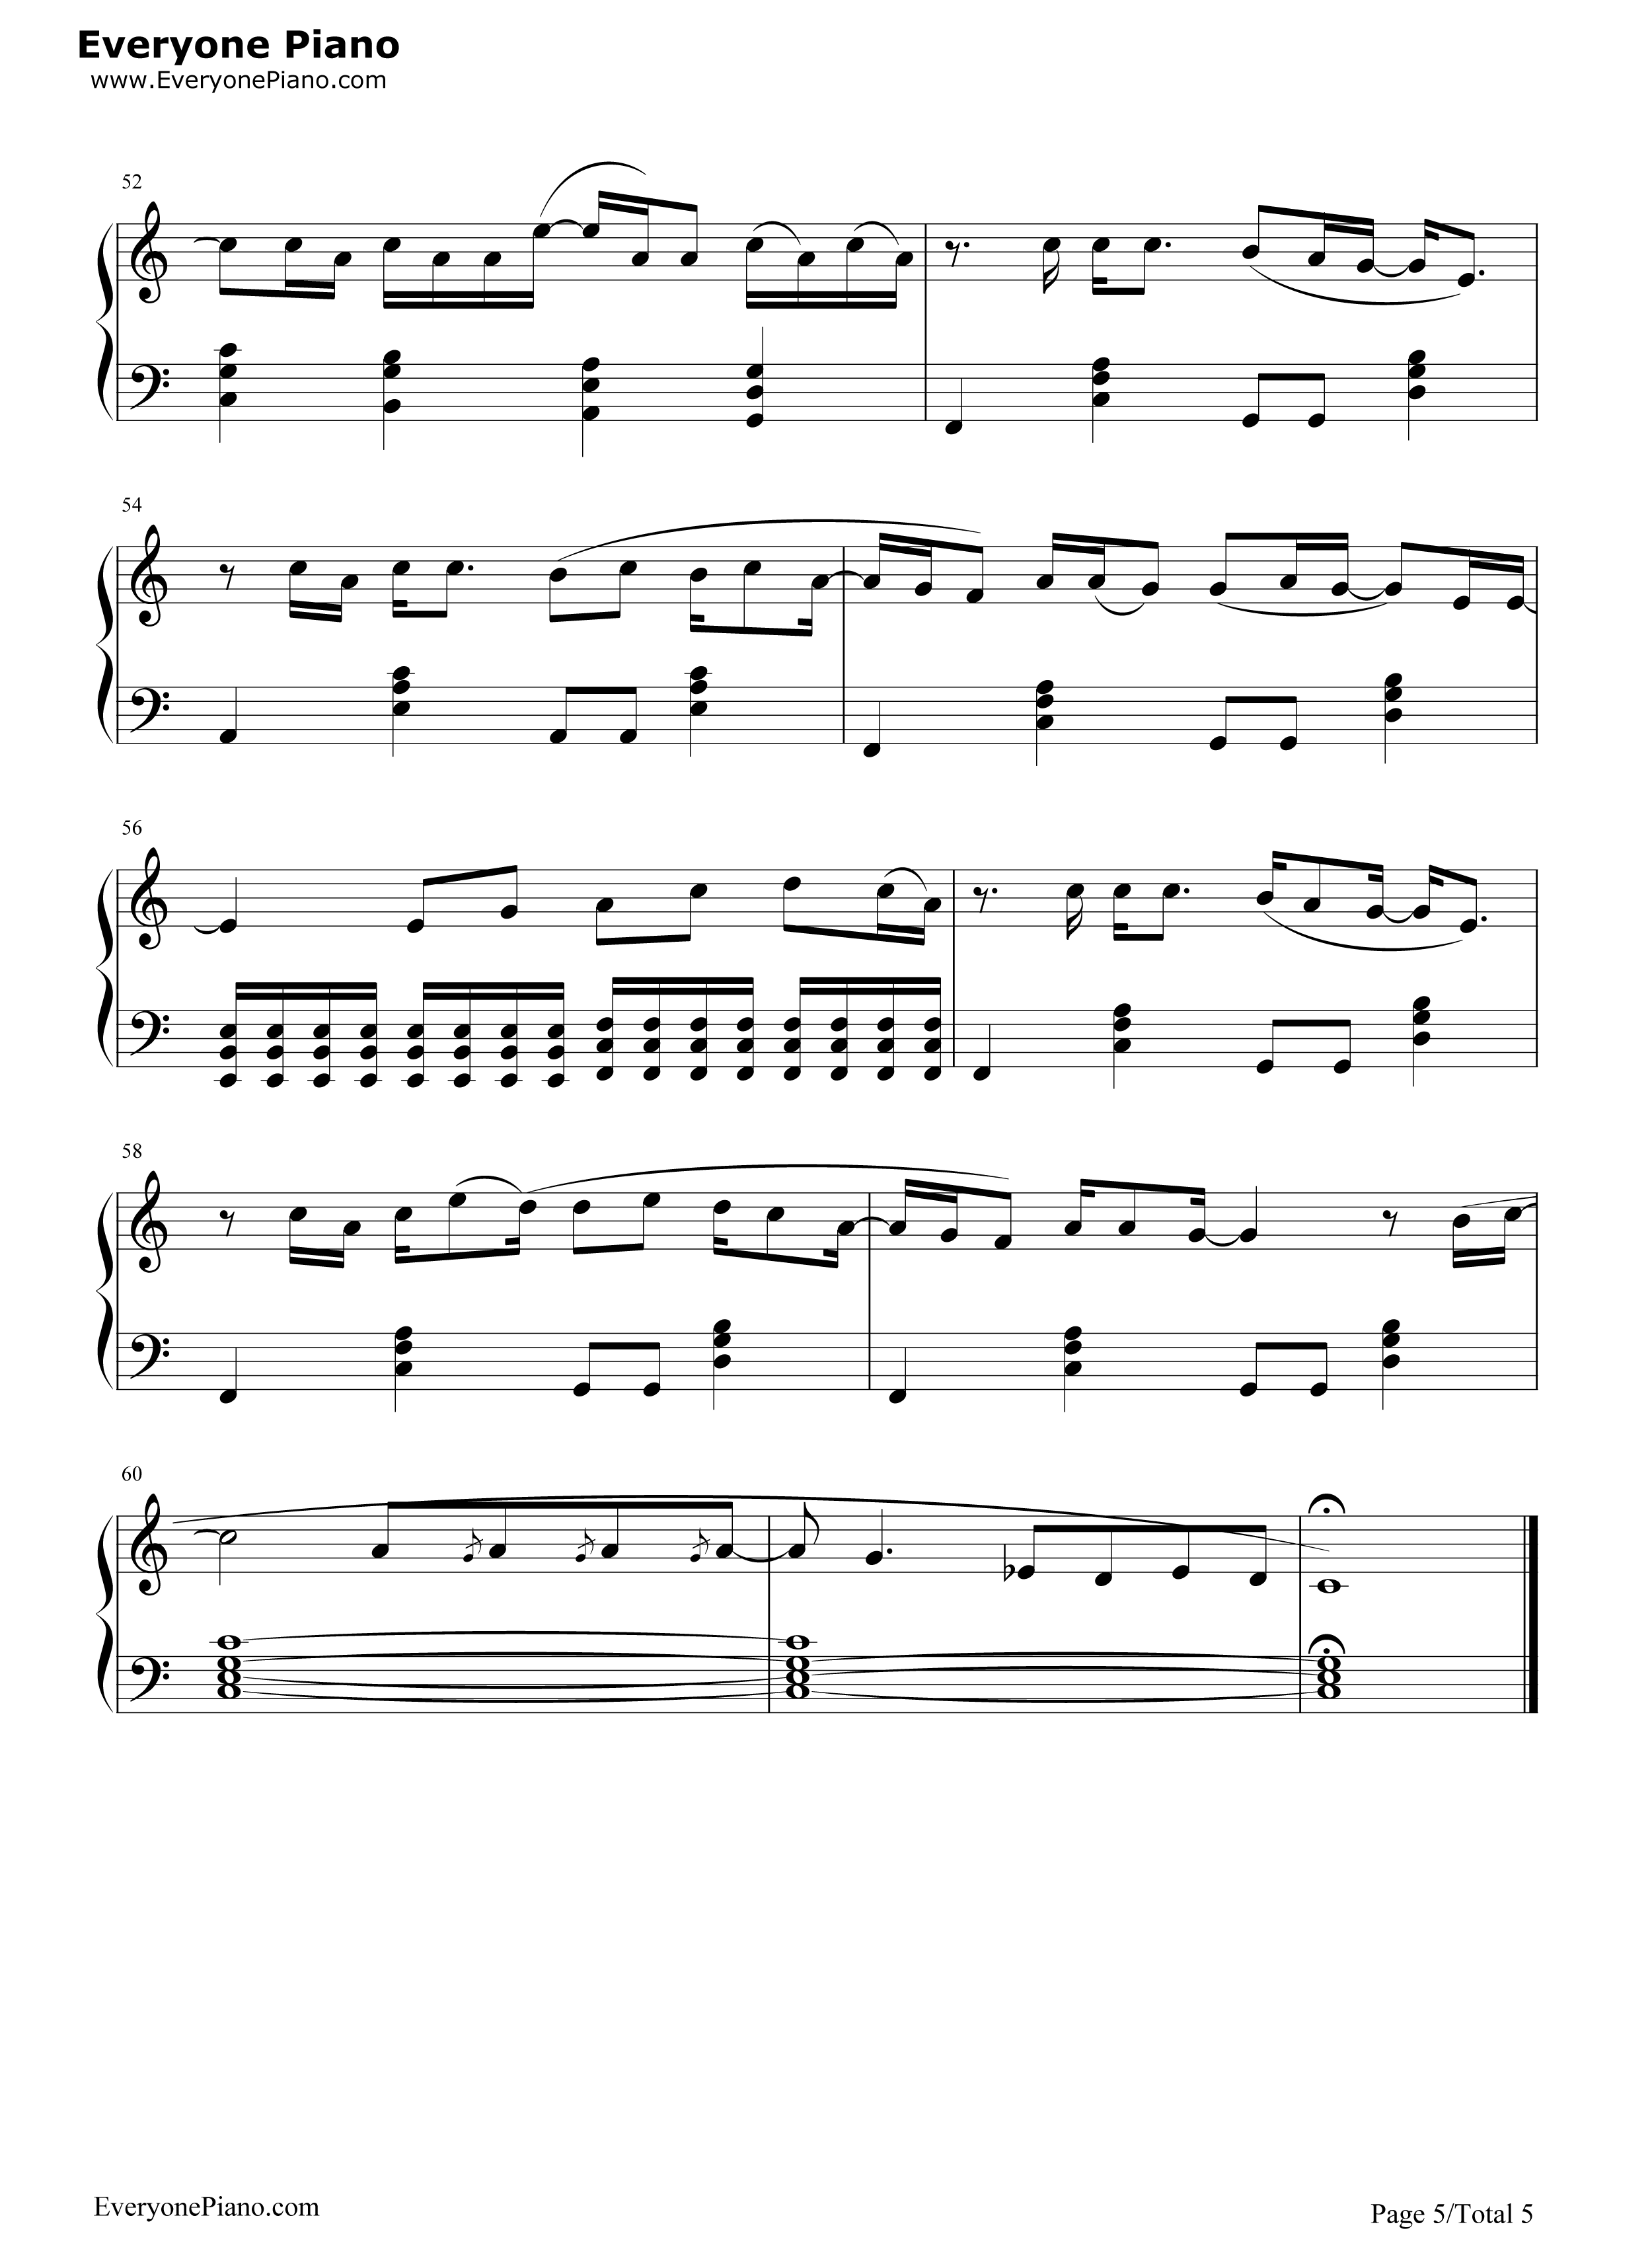 Guns N Roses Chords Echordscom 7479629 Ginkgobilobahelpfo